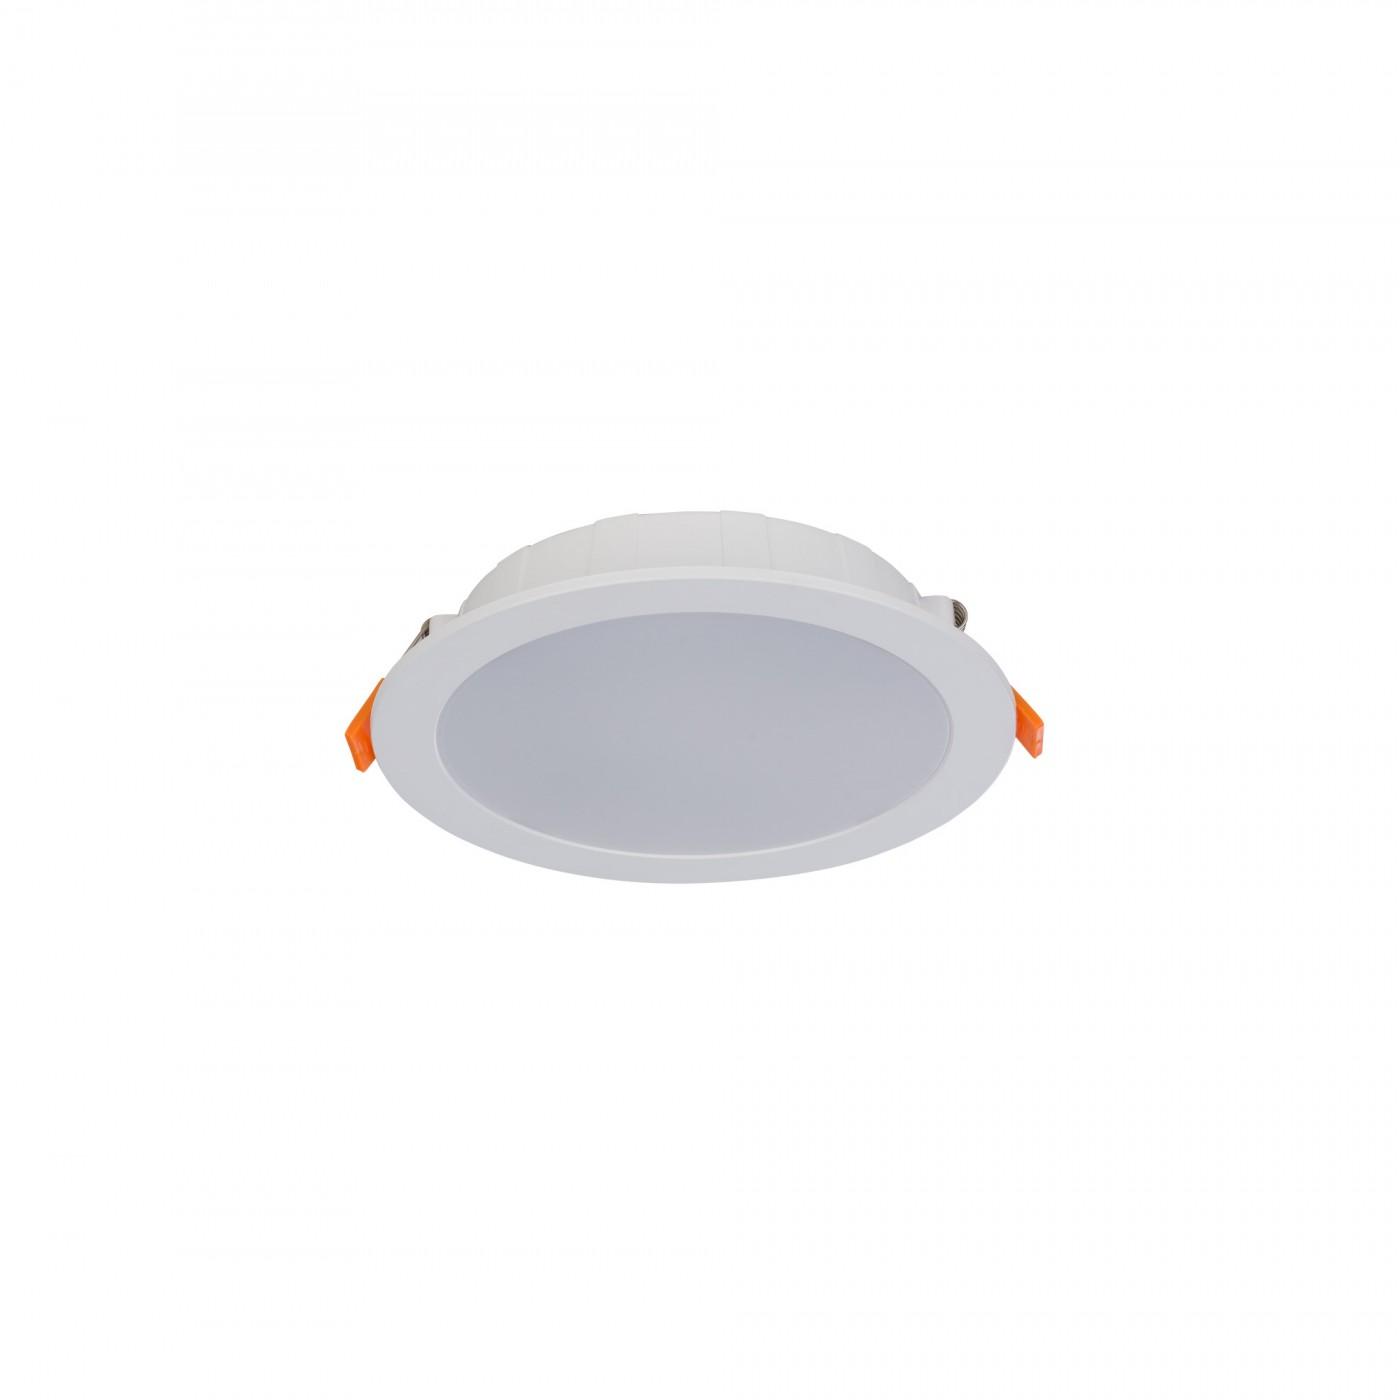 CL KOS LED 16W 4000K 8776 Nowodvorski Lighting